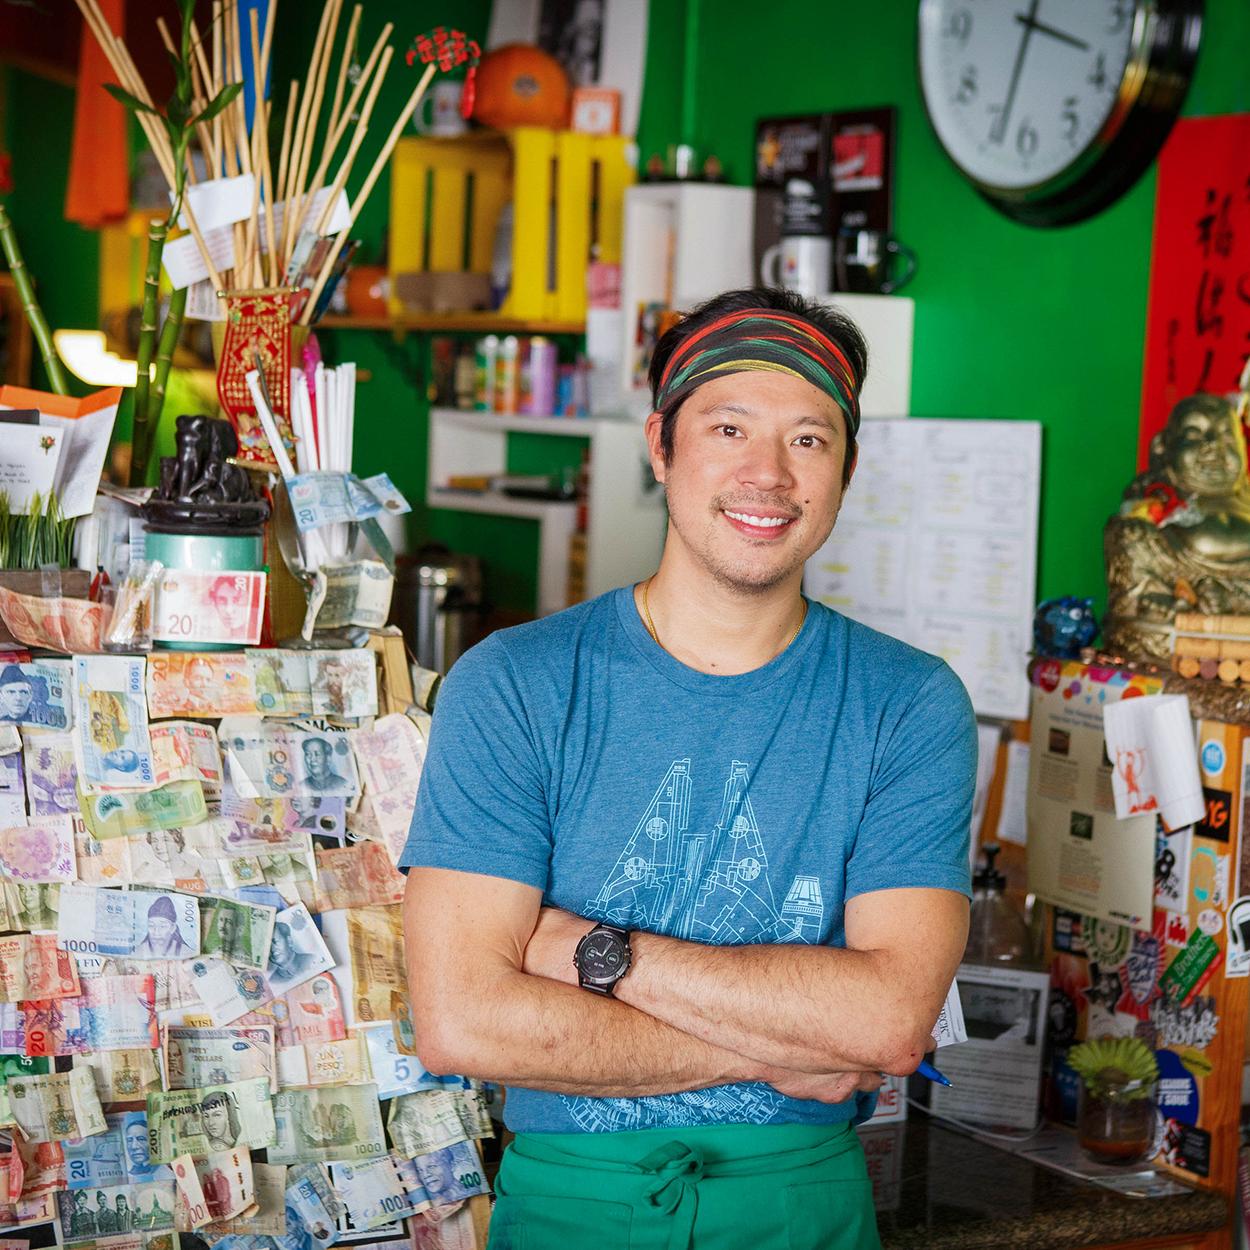 Cafe TH owner Minh